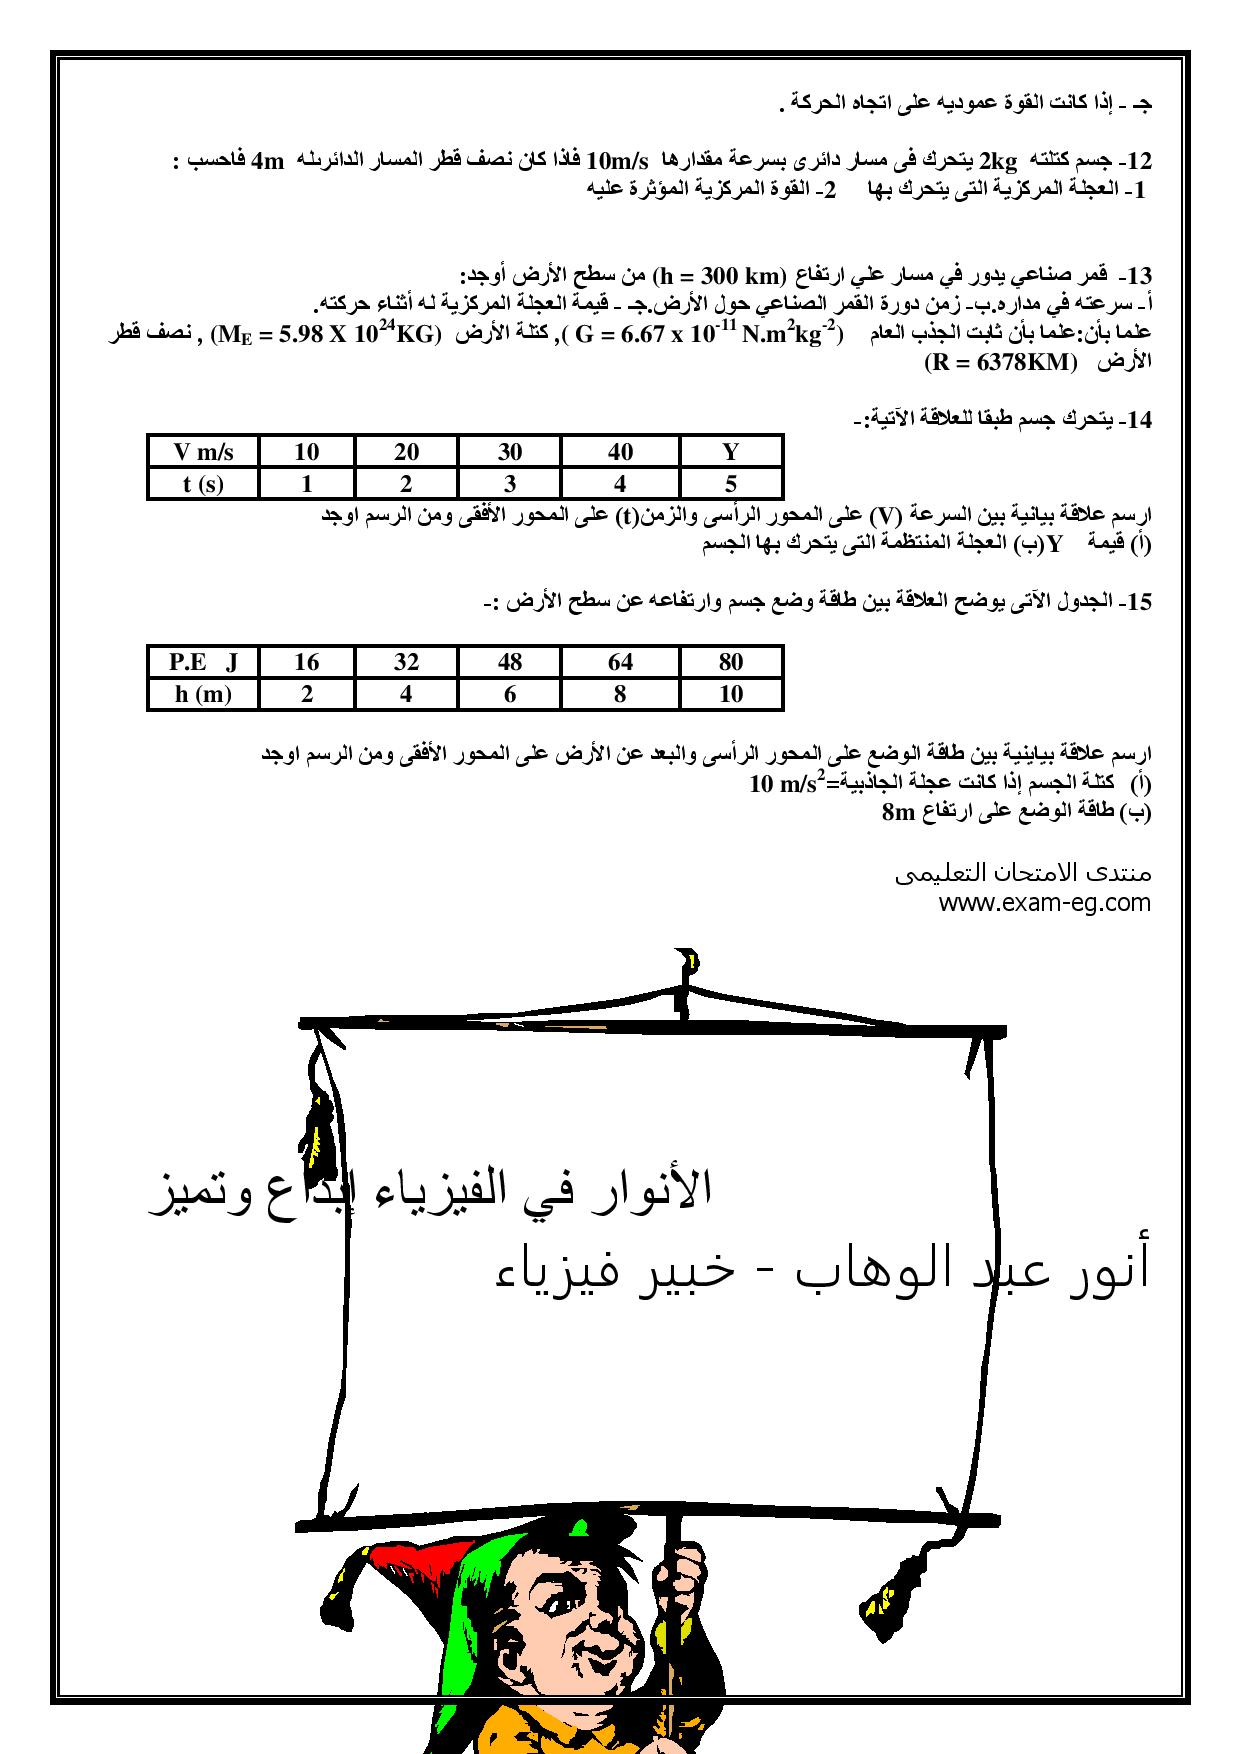 exam-eg.com_1462977506859.jpg